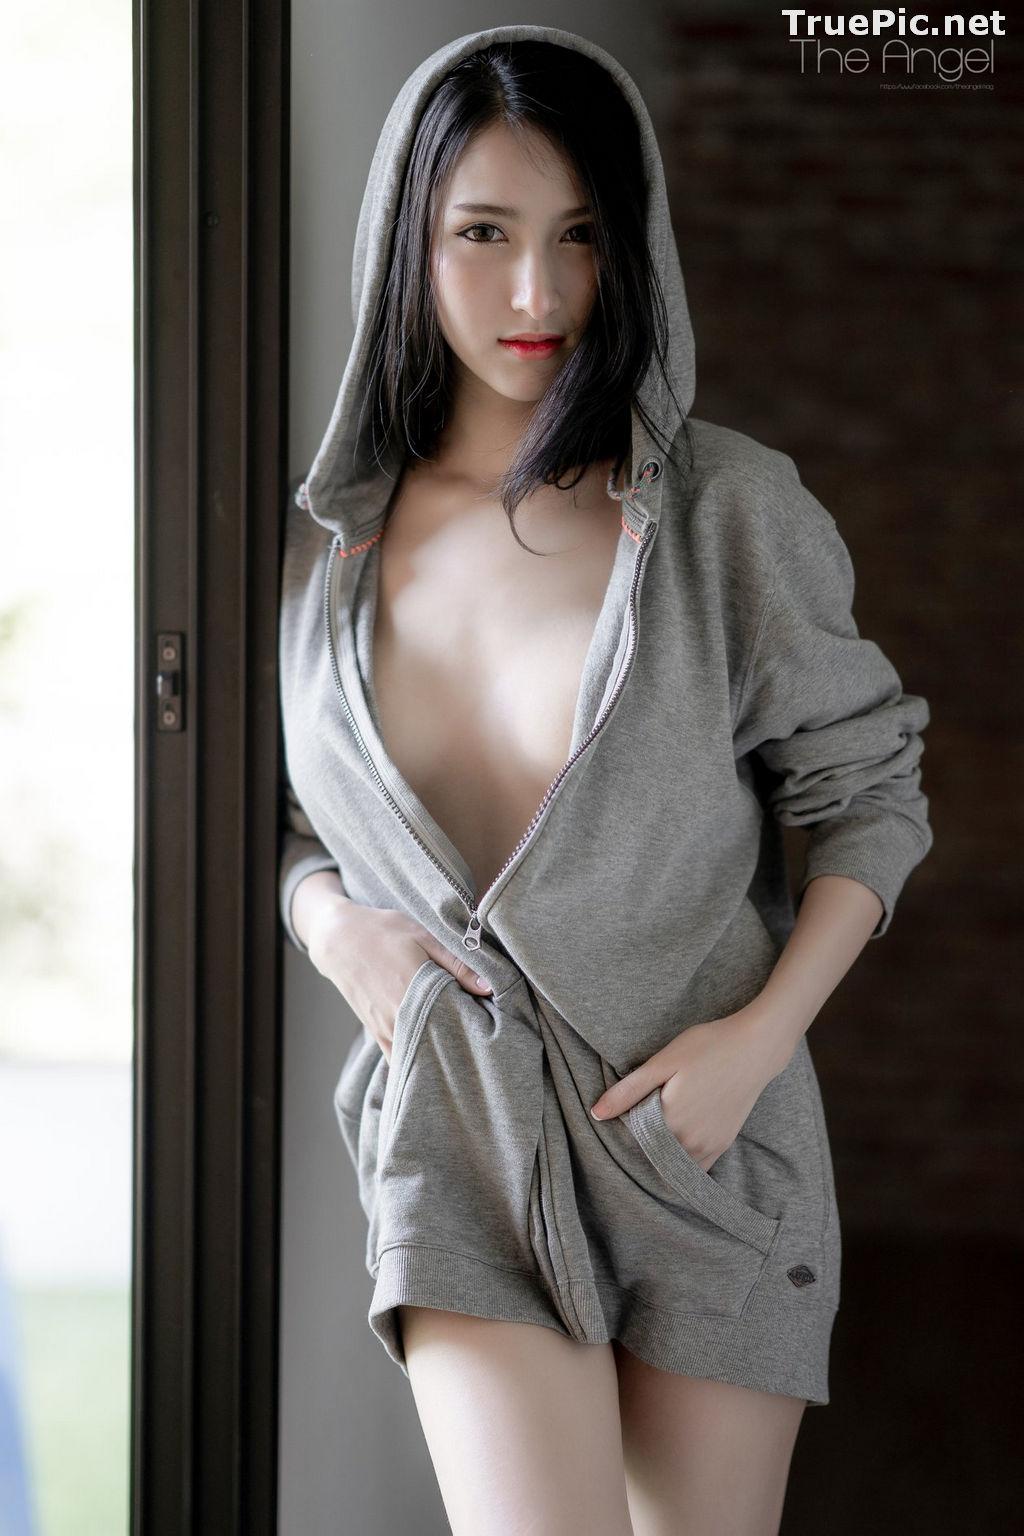 Image Thailand Model - เอมี่ เอมิลี่ - My Beautiful Angel - TruePic.net - Picture-3